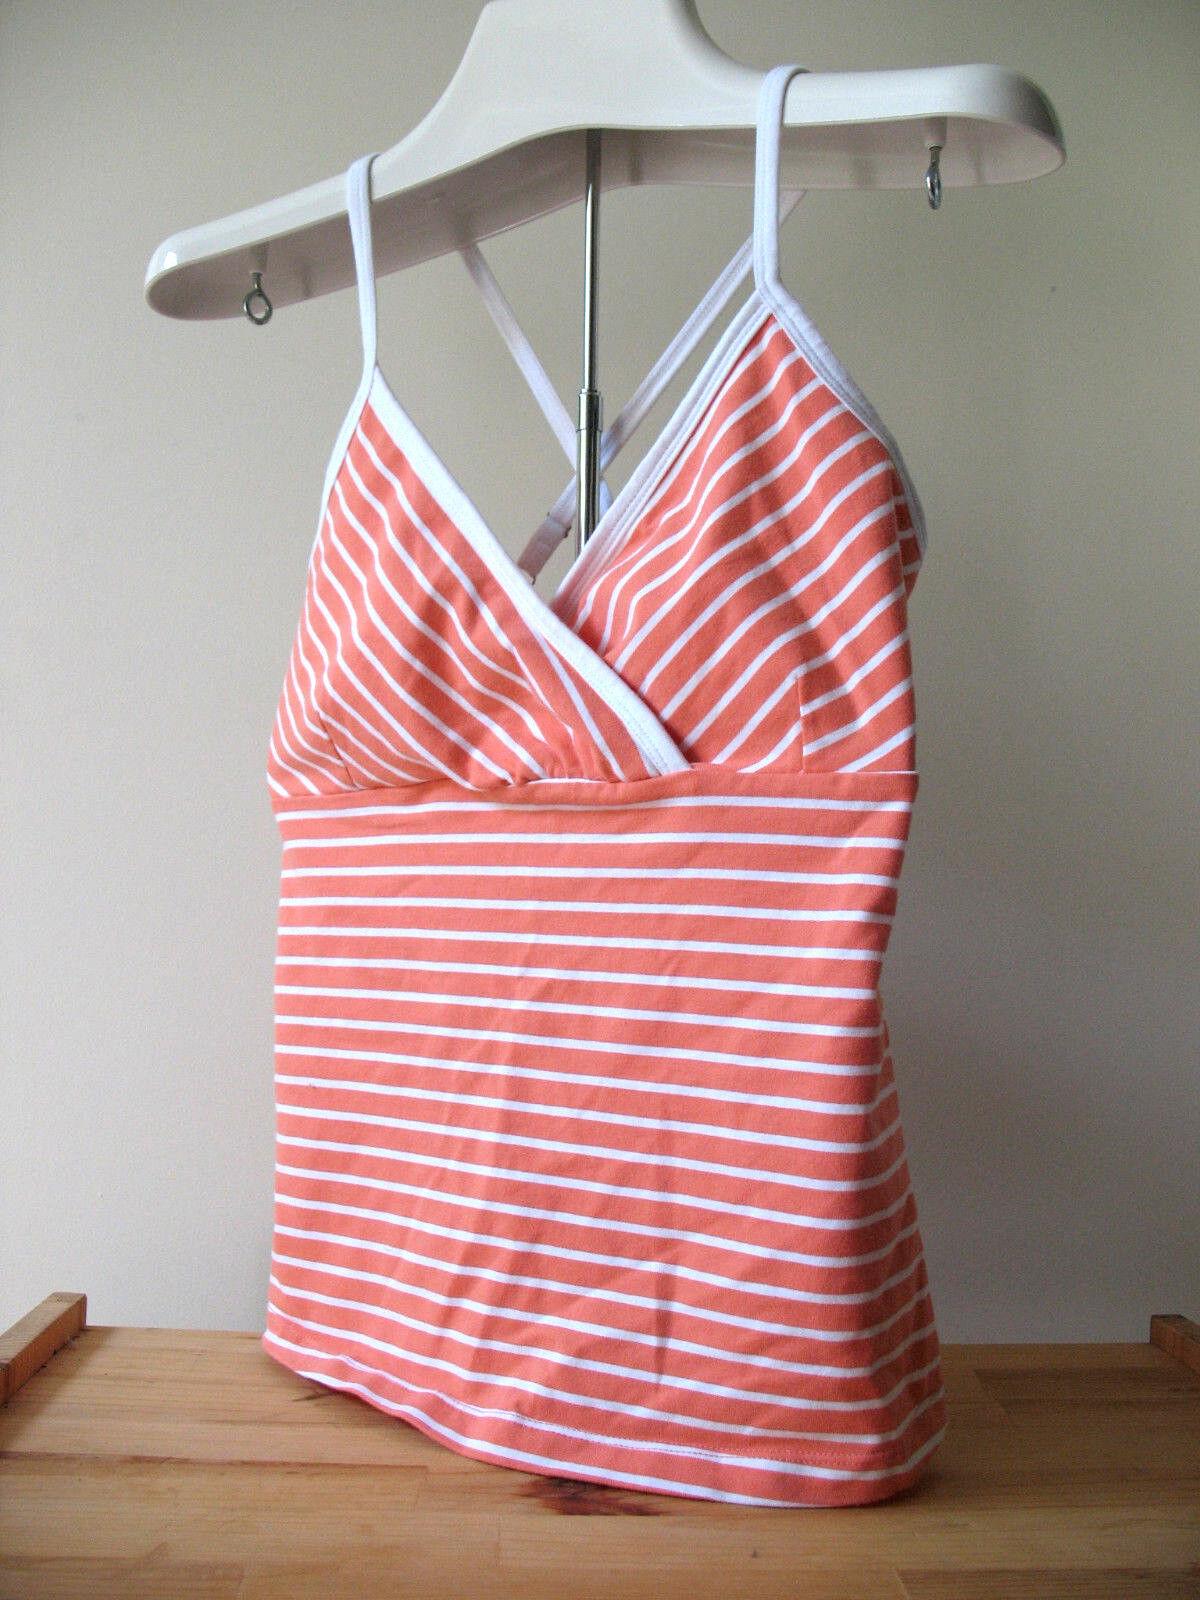 NEW Marika Sexy Stripe Criss Cross Coral orange White Cotton Yoga Knit Top L  54